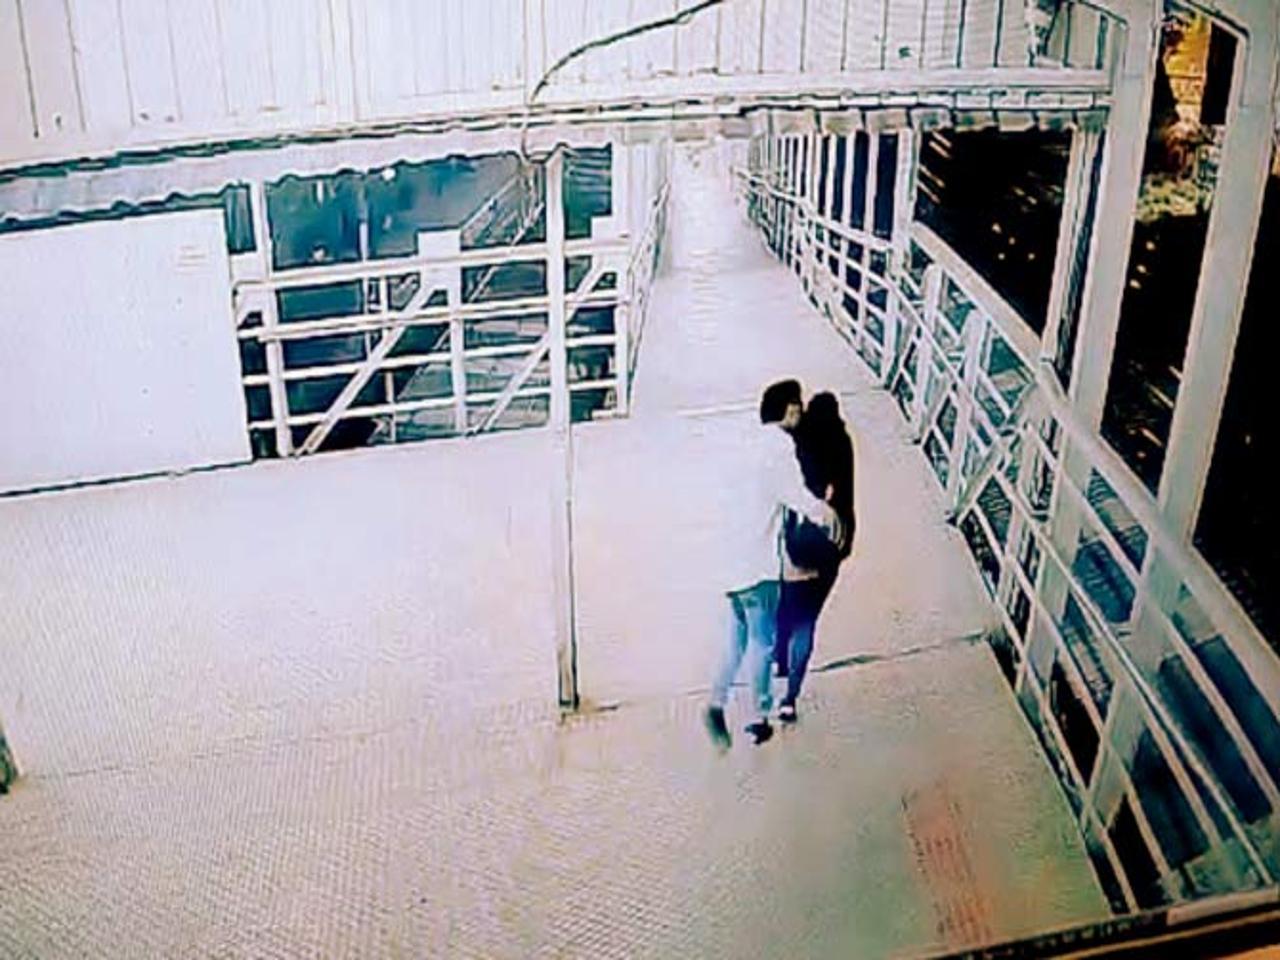 man accused of brazenly molesting women on a railway bridge at Matungaக்கான பட முடிவுகள்